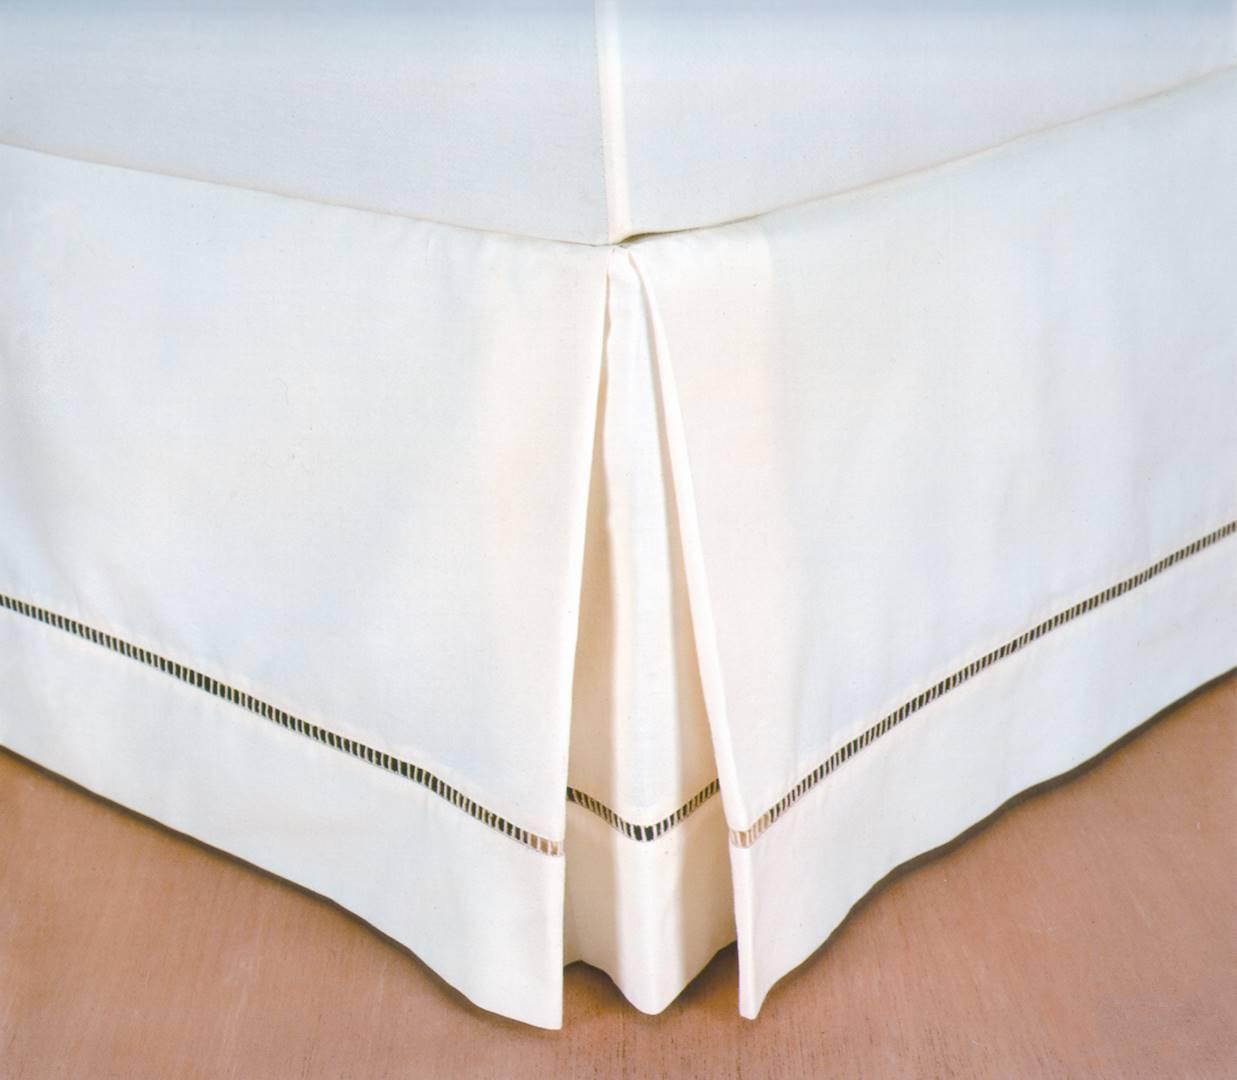 Saia para Cama Box cor Branco King 190 cm (LARG) - 43593